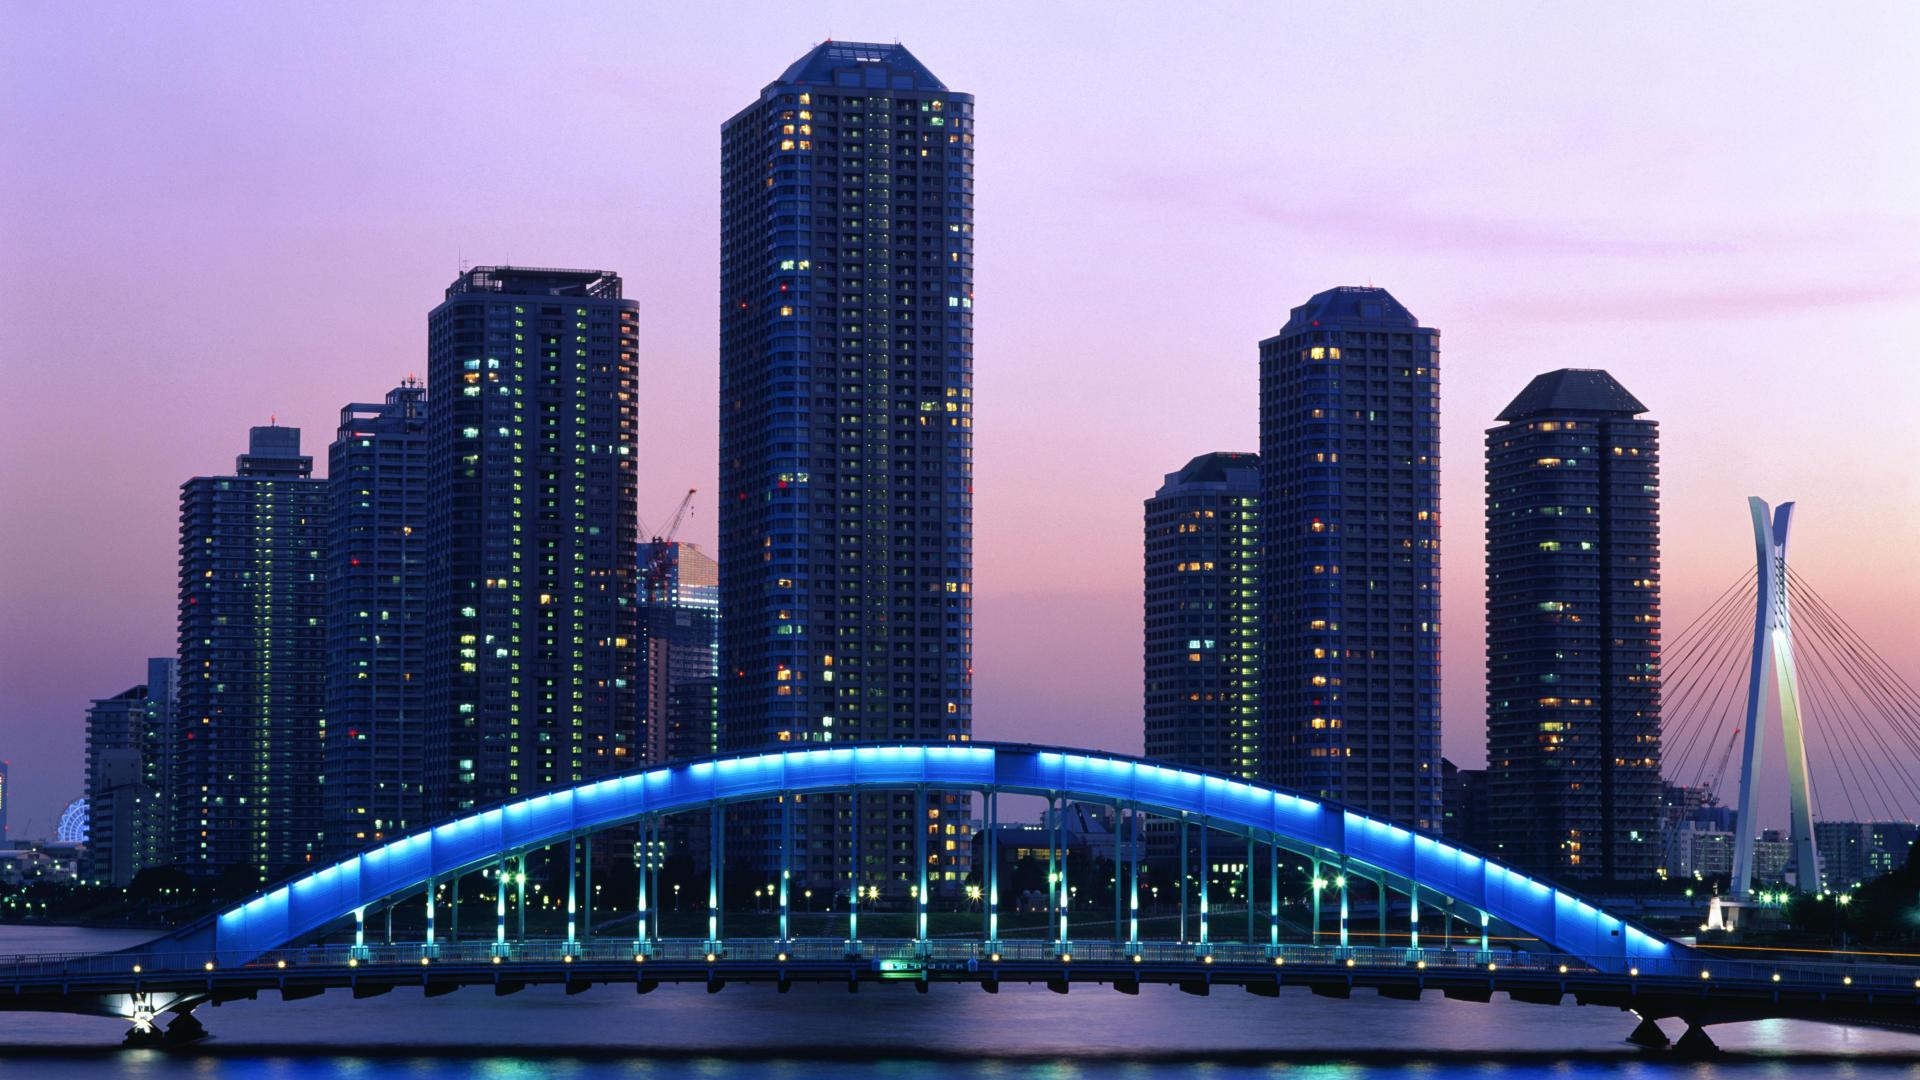 Япония с востока на запад весенние каникулы!